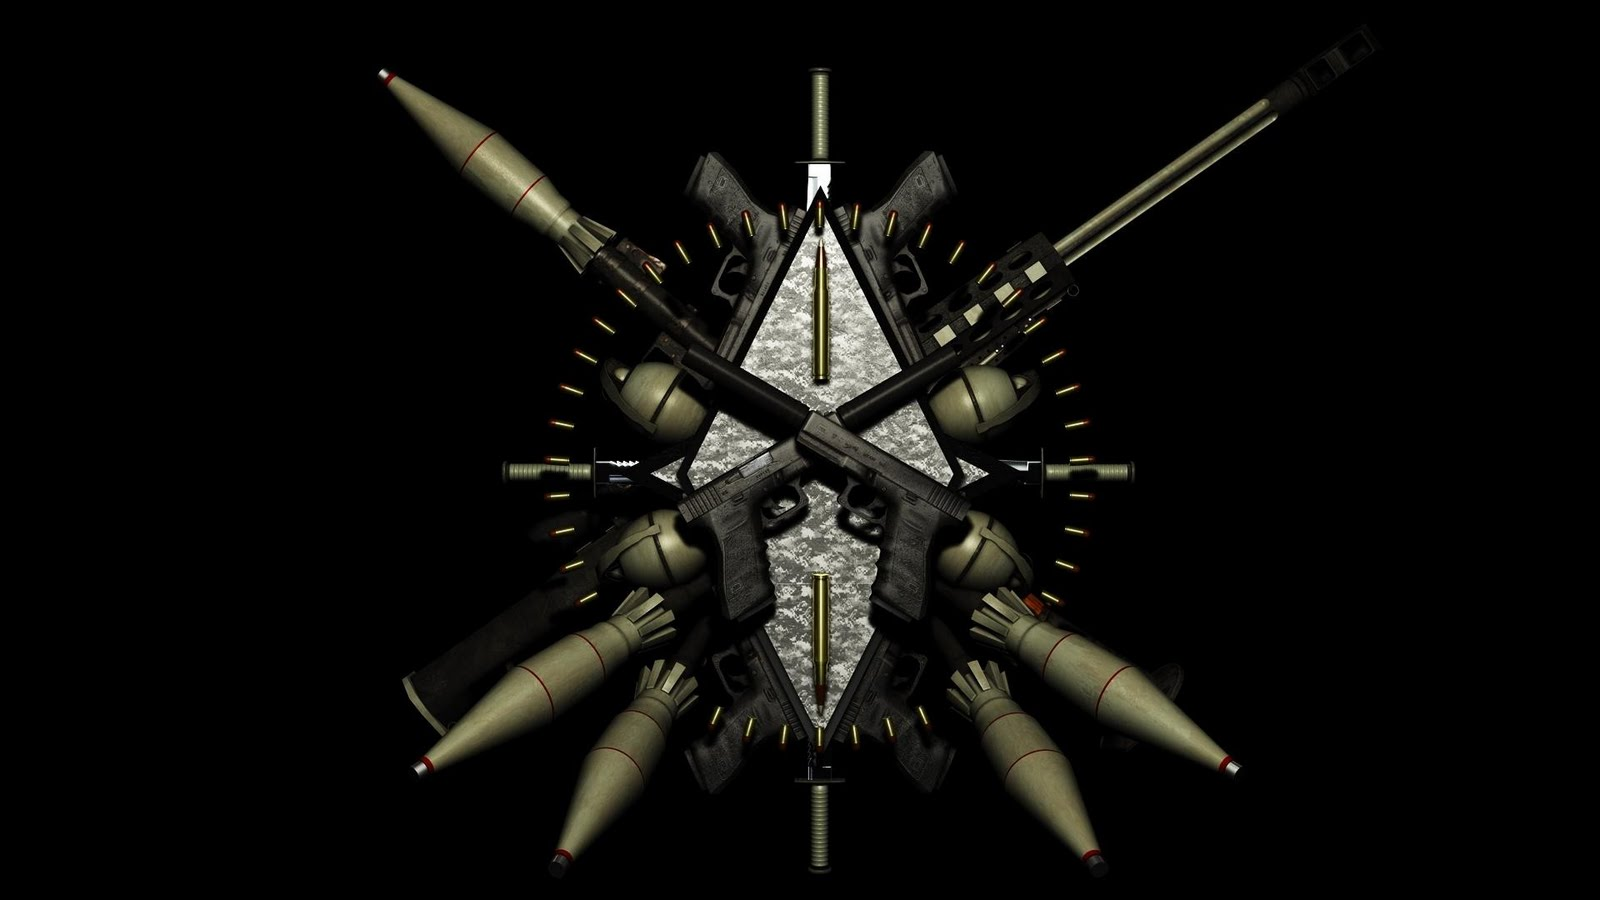 Guns Wallpaper Hd: Pic New Posts: Full Hd Wallpaper Guns